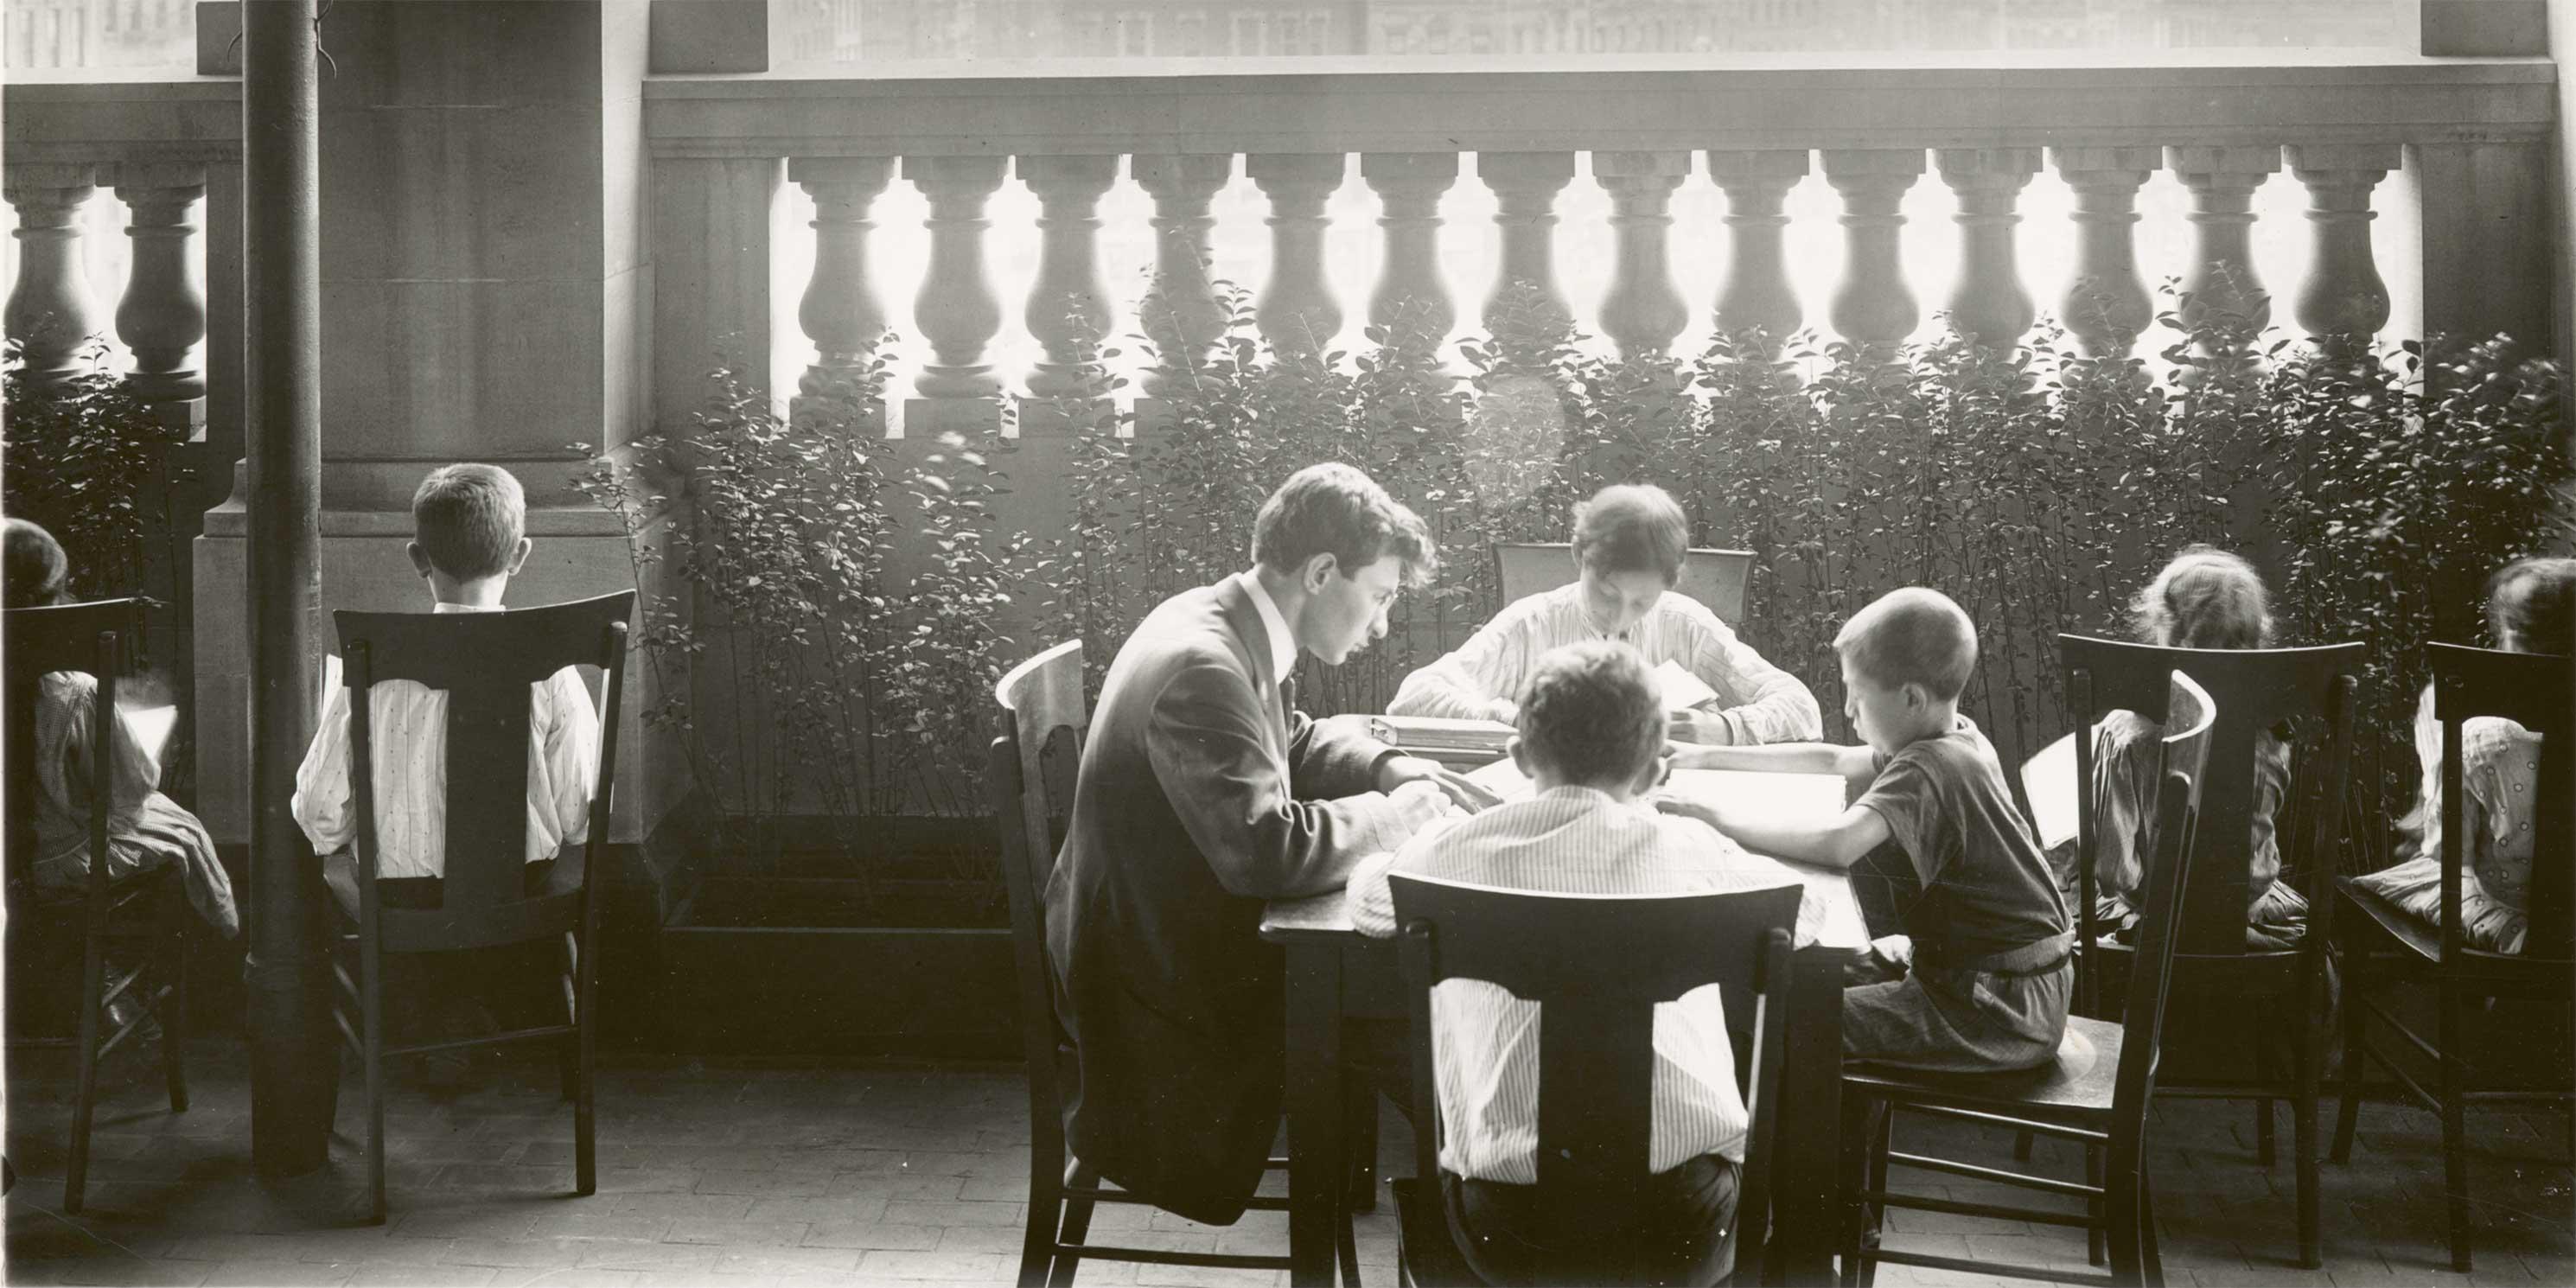 The New York Public Library's Seward Park Roof Reading Room in 1910. Photo: The New York Public Library.